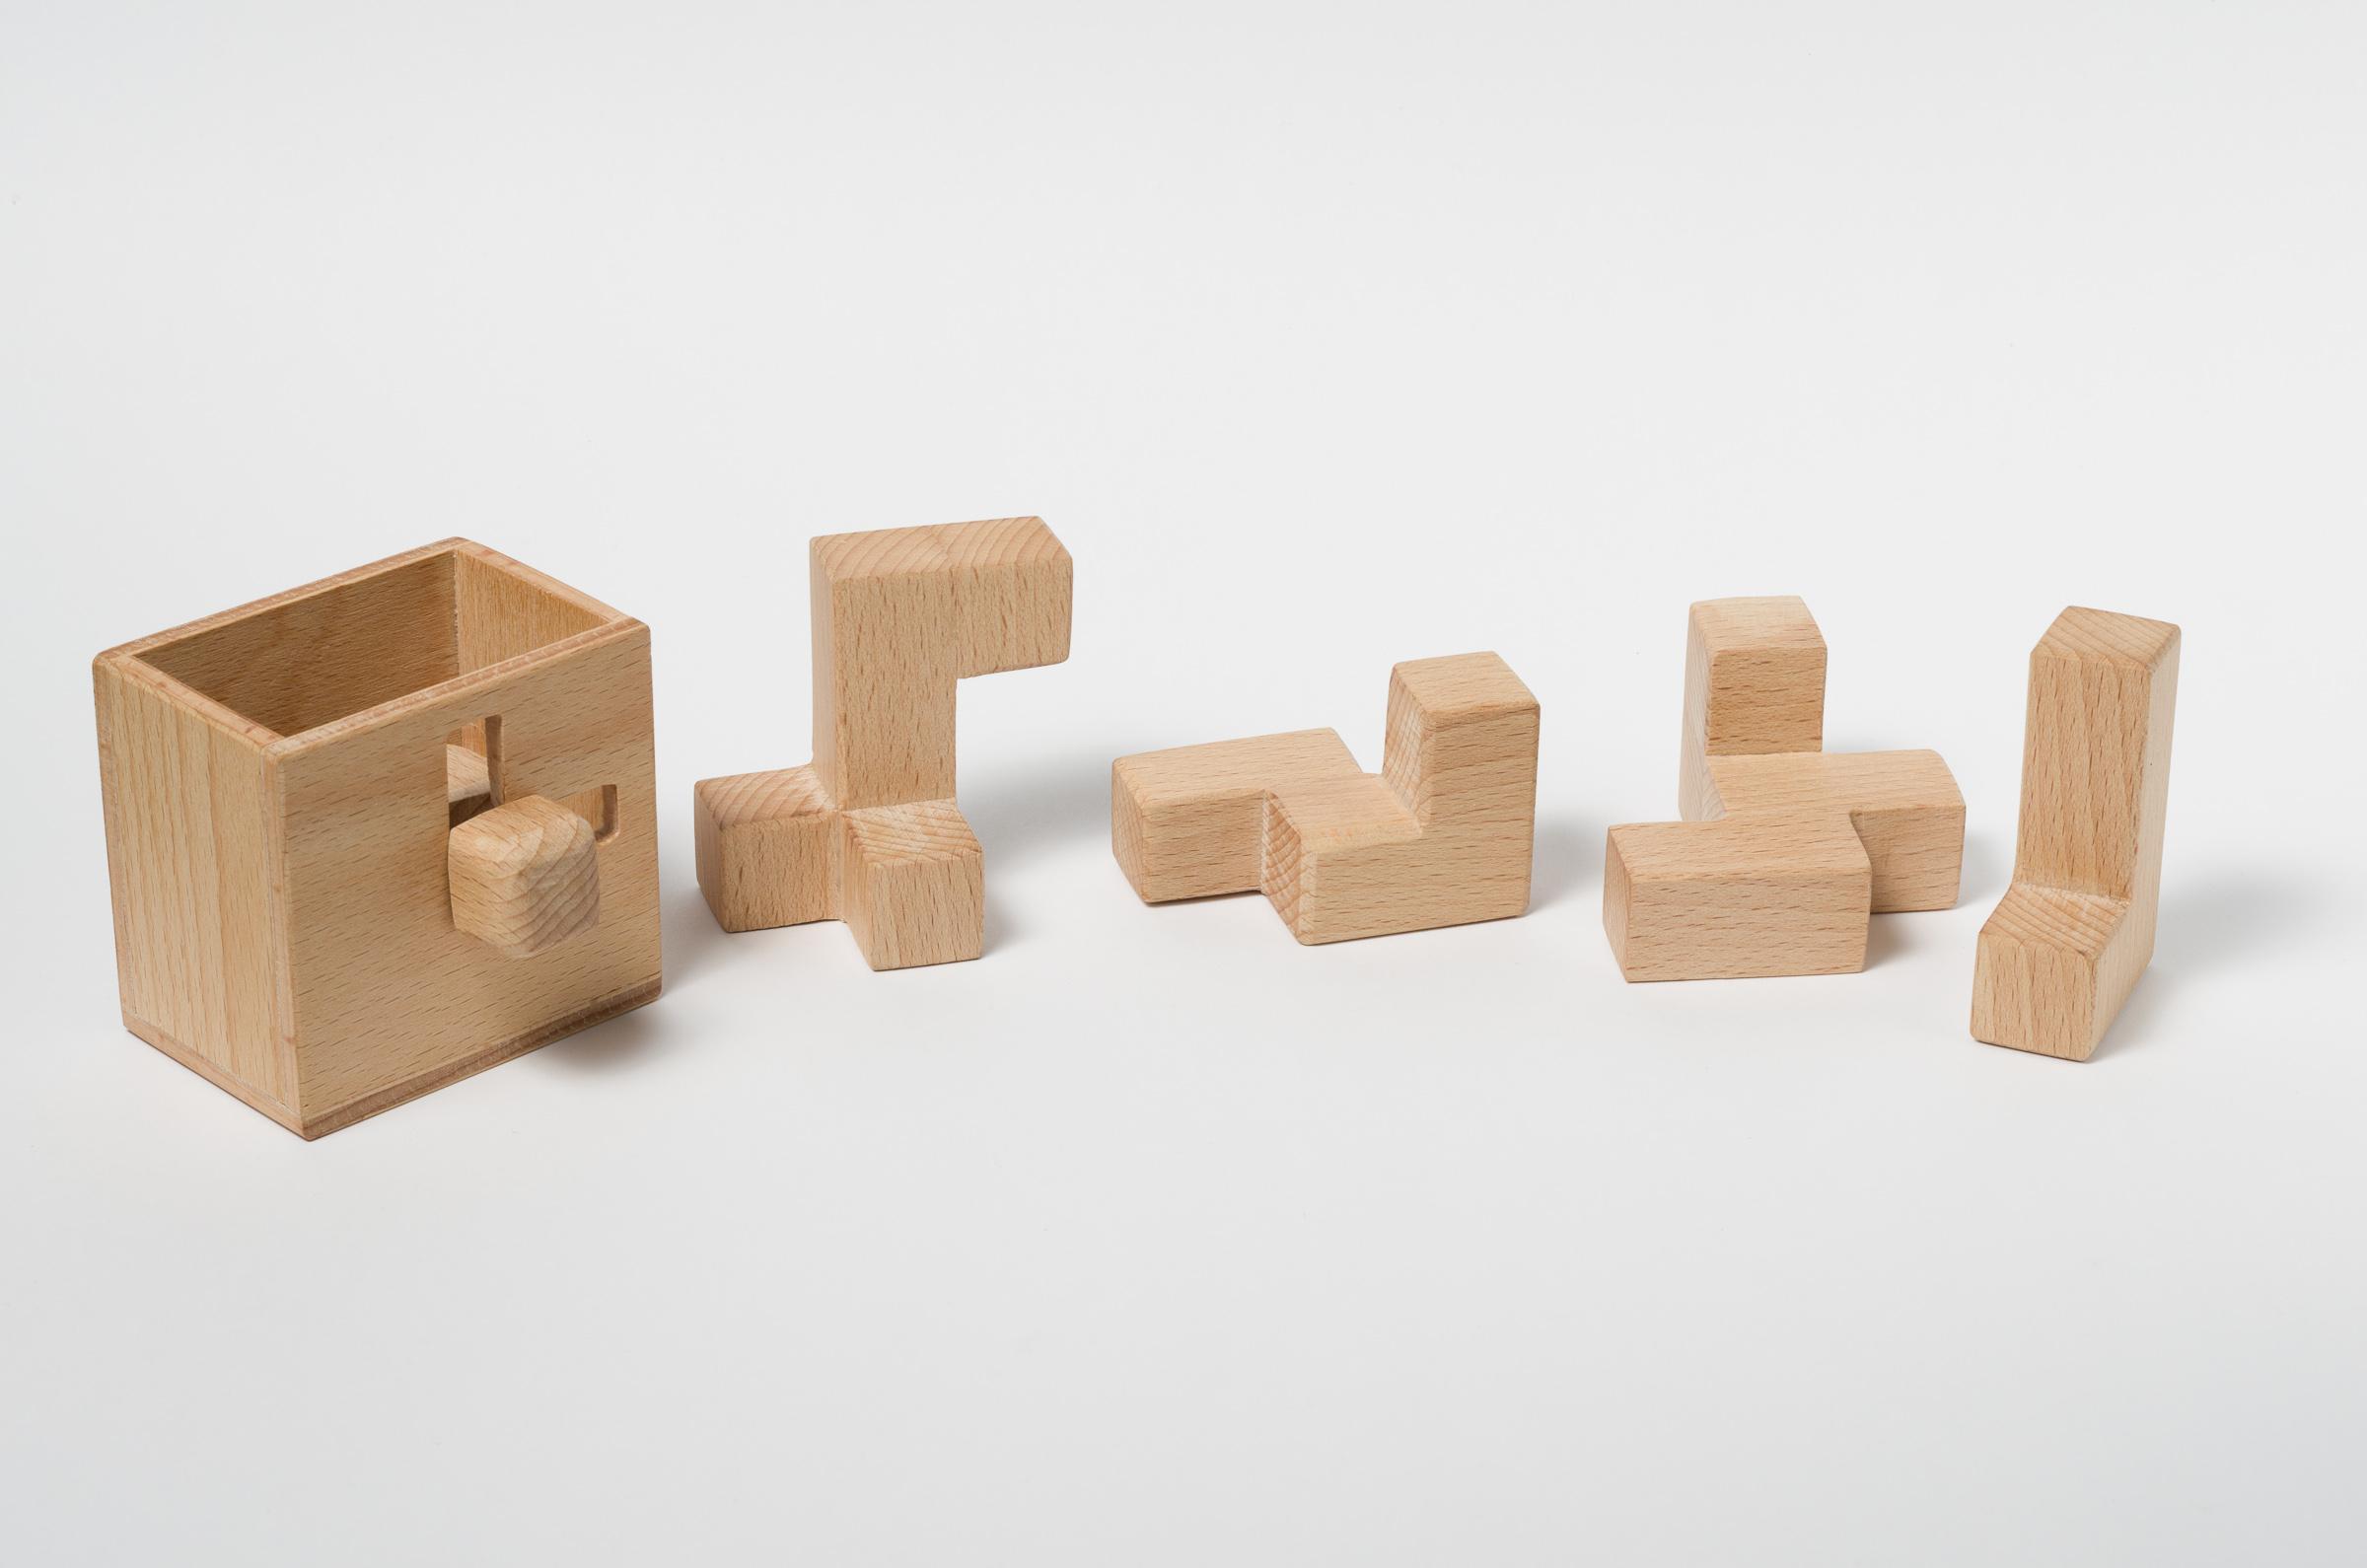 movingcube_woodbox.jpg